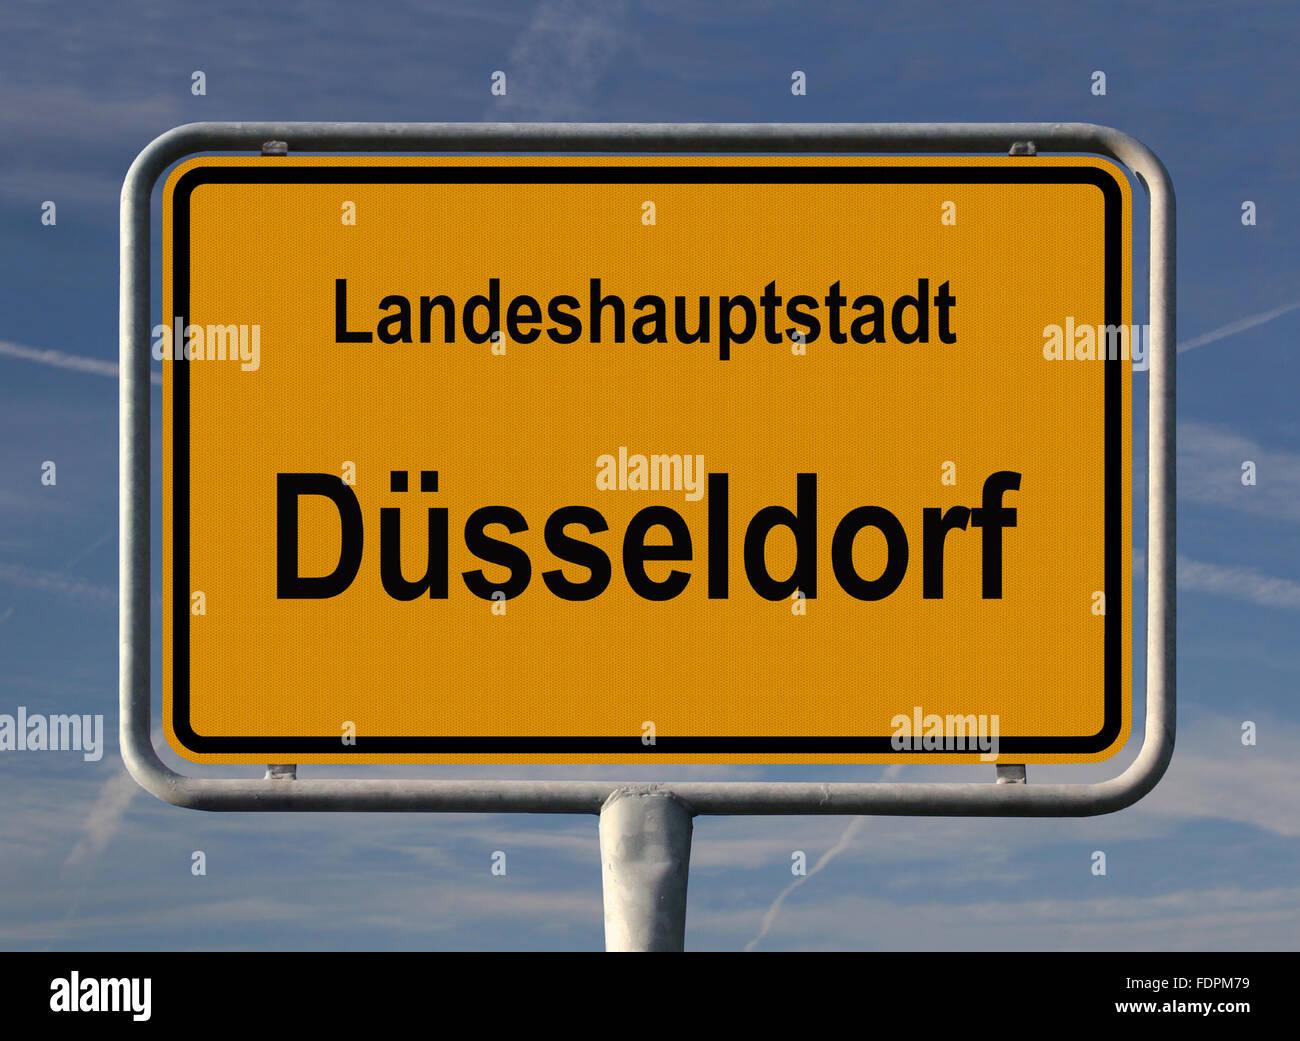 düsseldorf,capital cities,north rhine westphalia,city sign - Stock Image